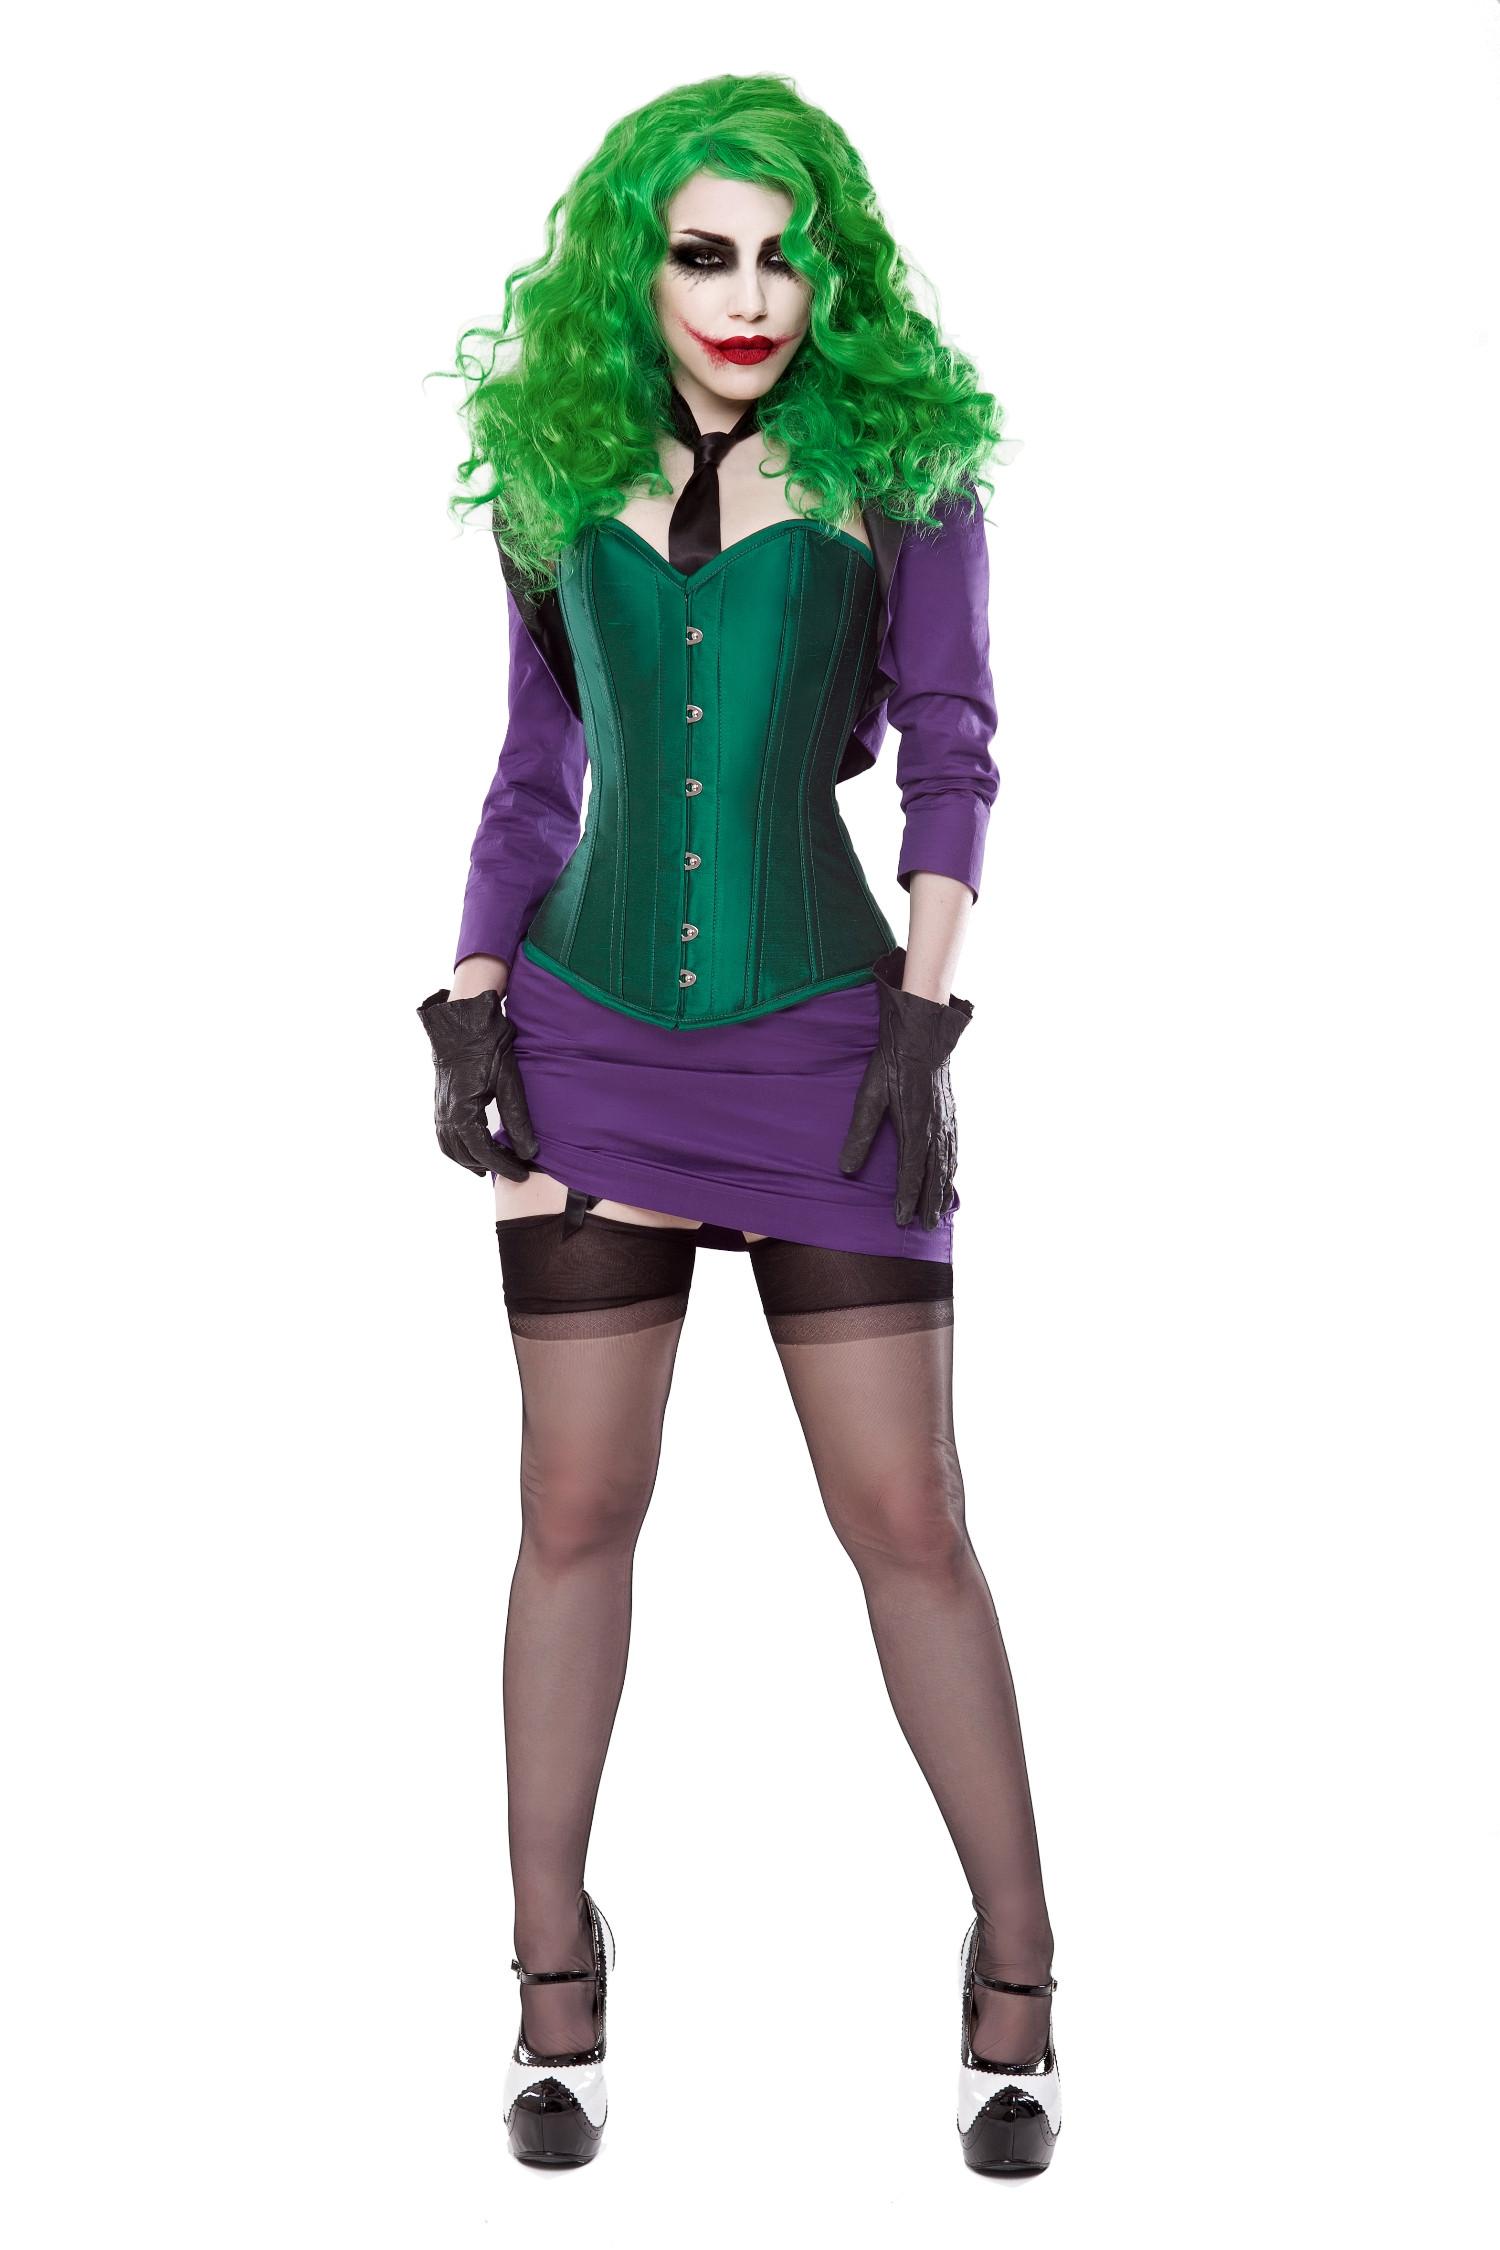 Green Silk Corset With Purple Bolero & Skirt Outfit